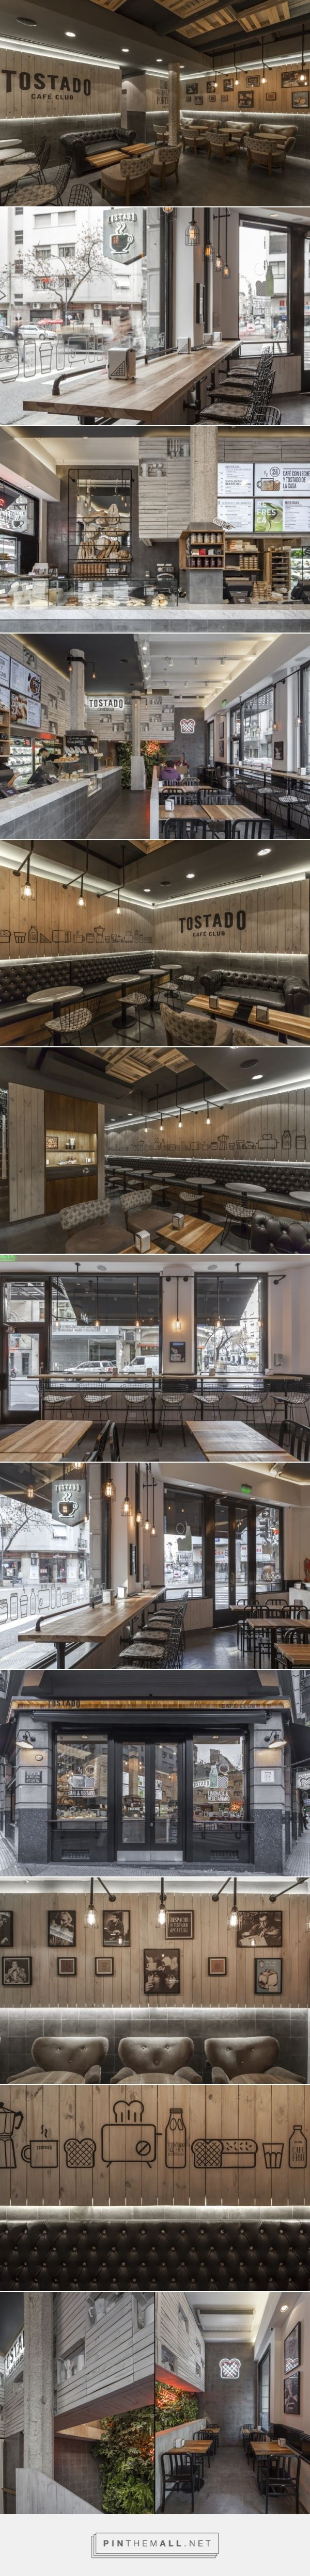 Tostado Cafe Club by Hitzig Militello Arquitectos, Buenos Aires – Argentina » Retail Design Blog..